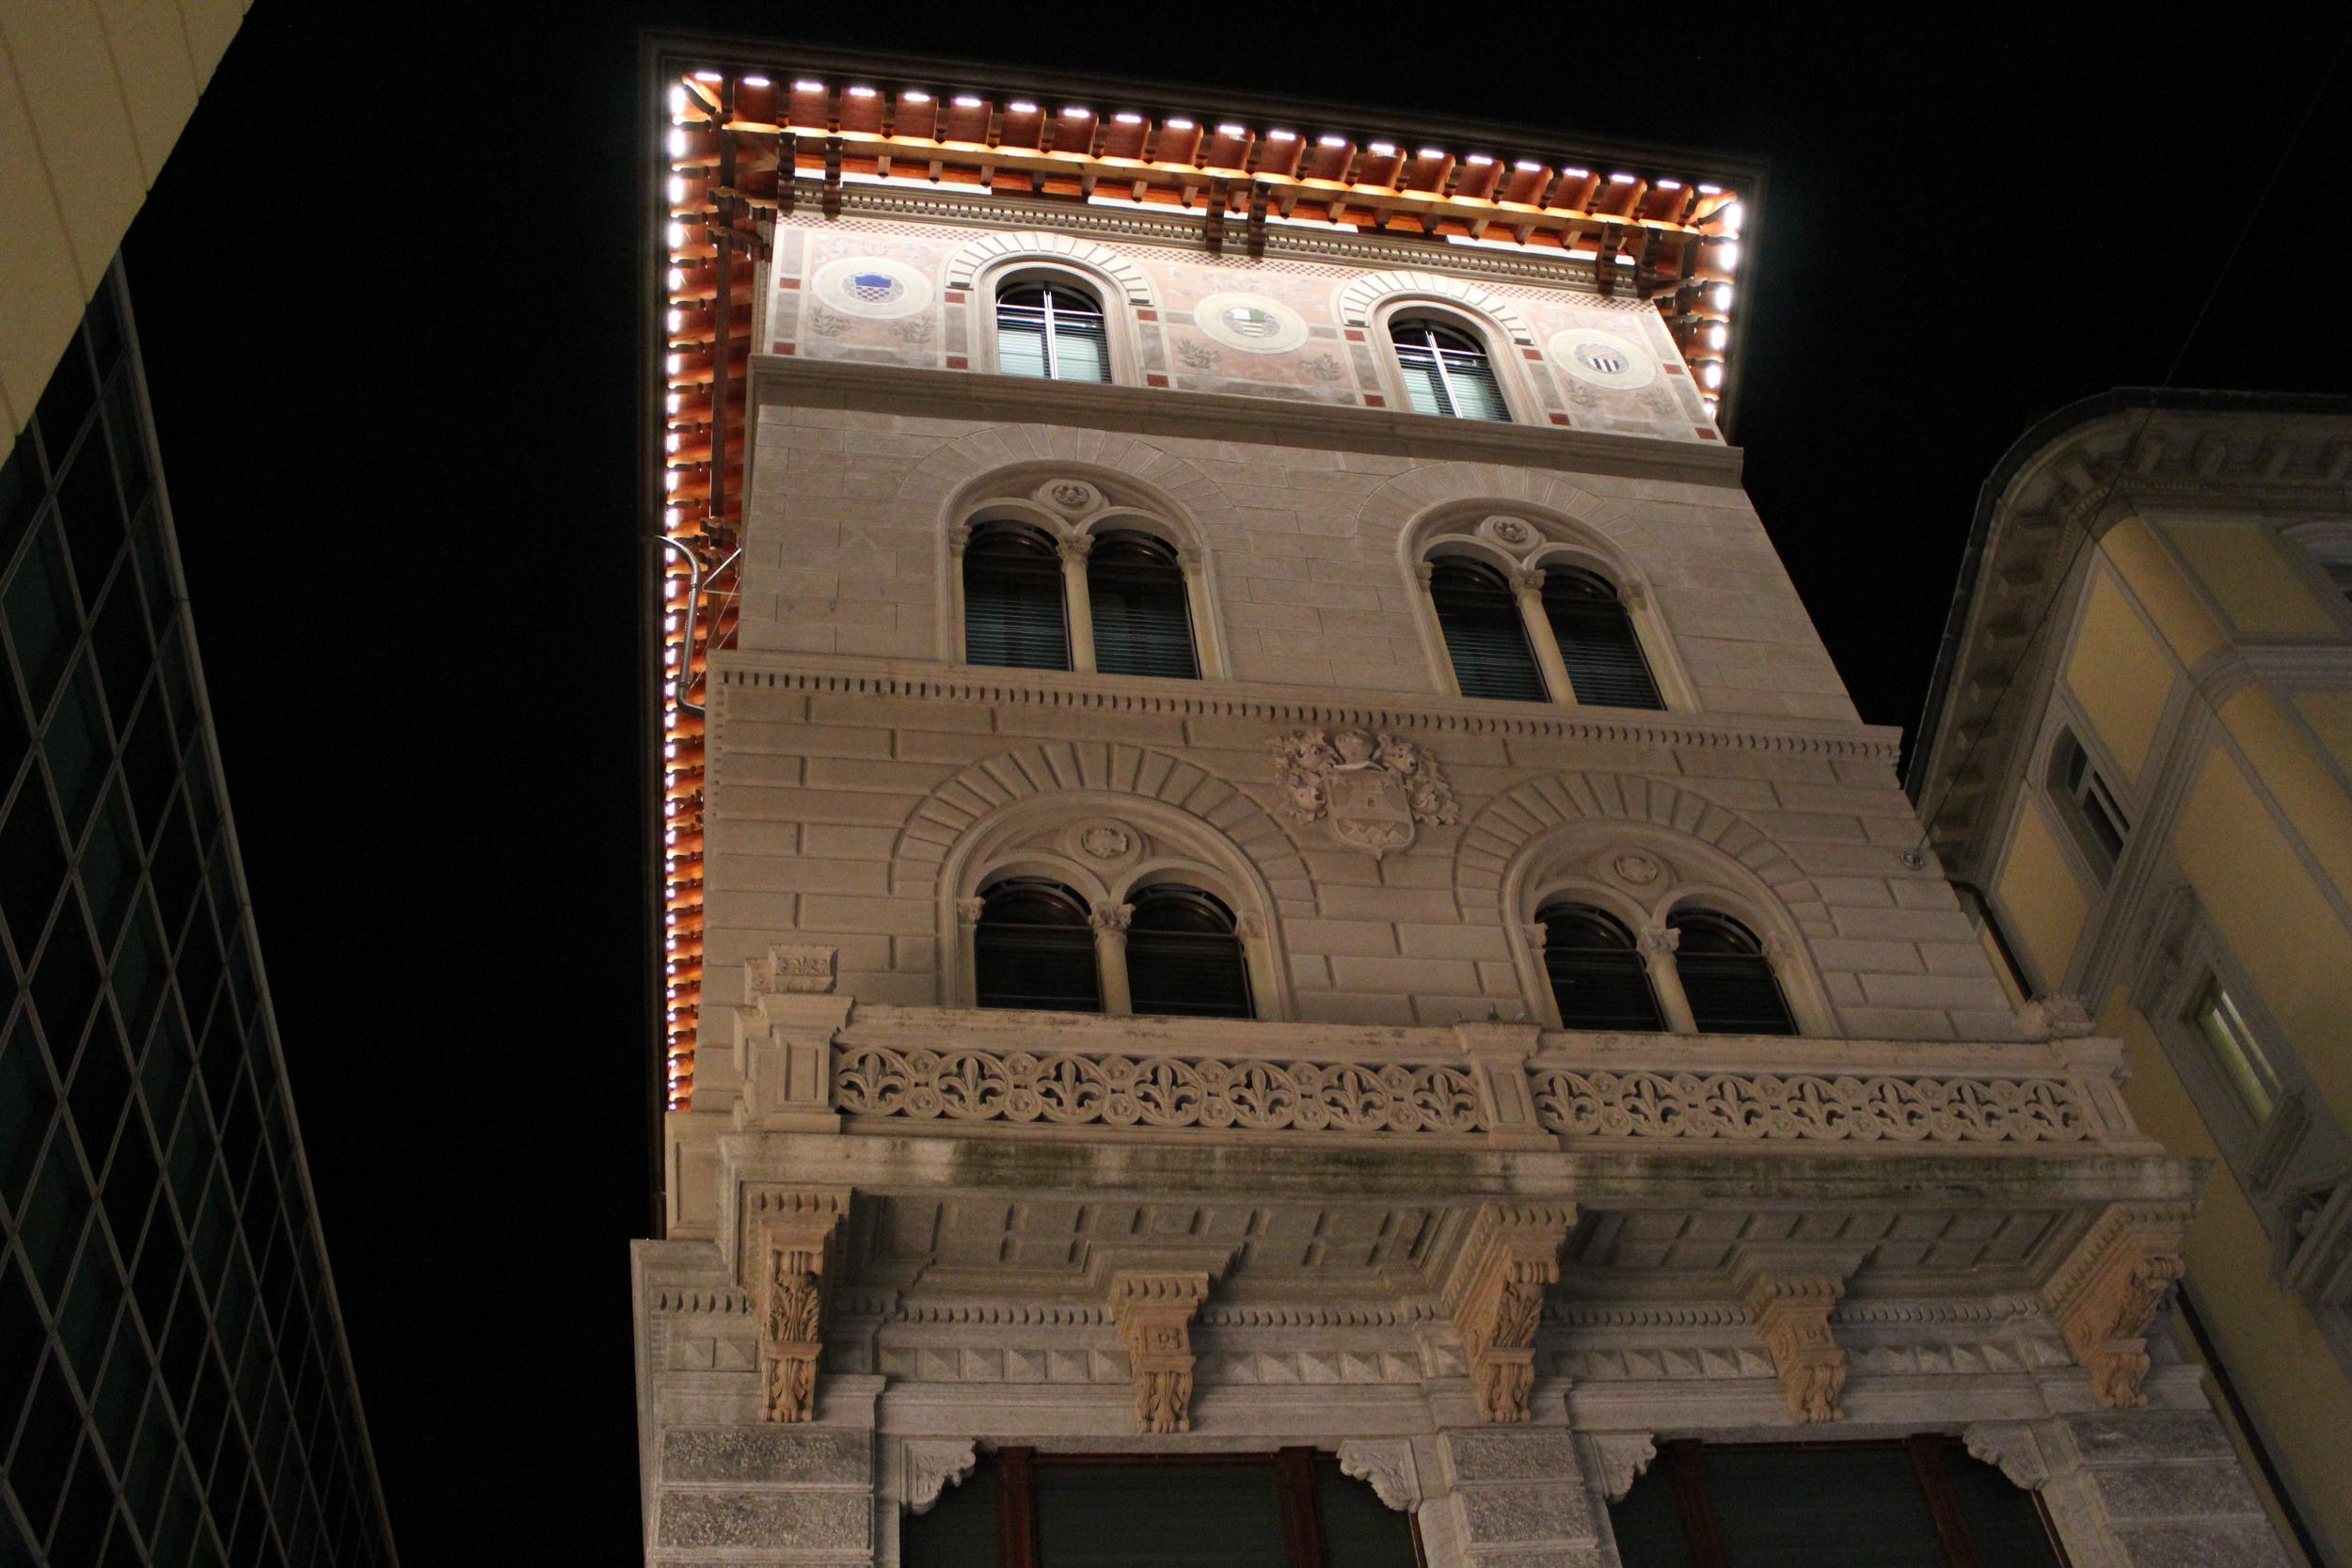 interestingly lit building